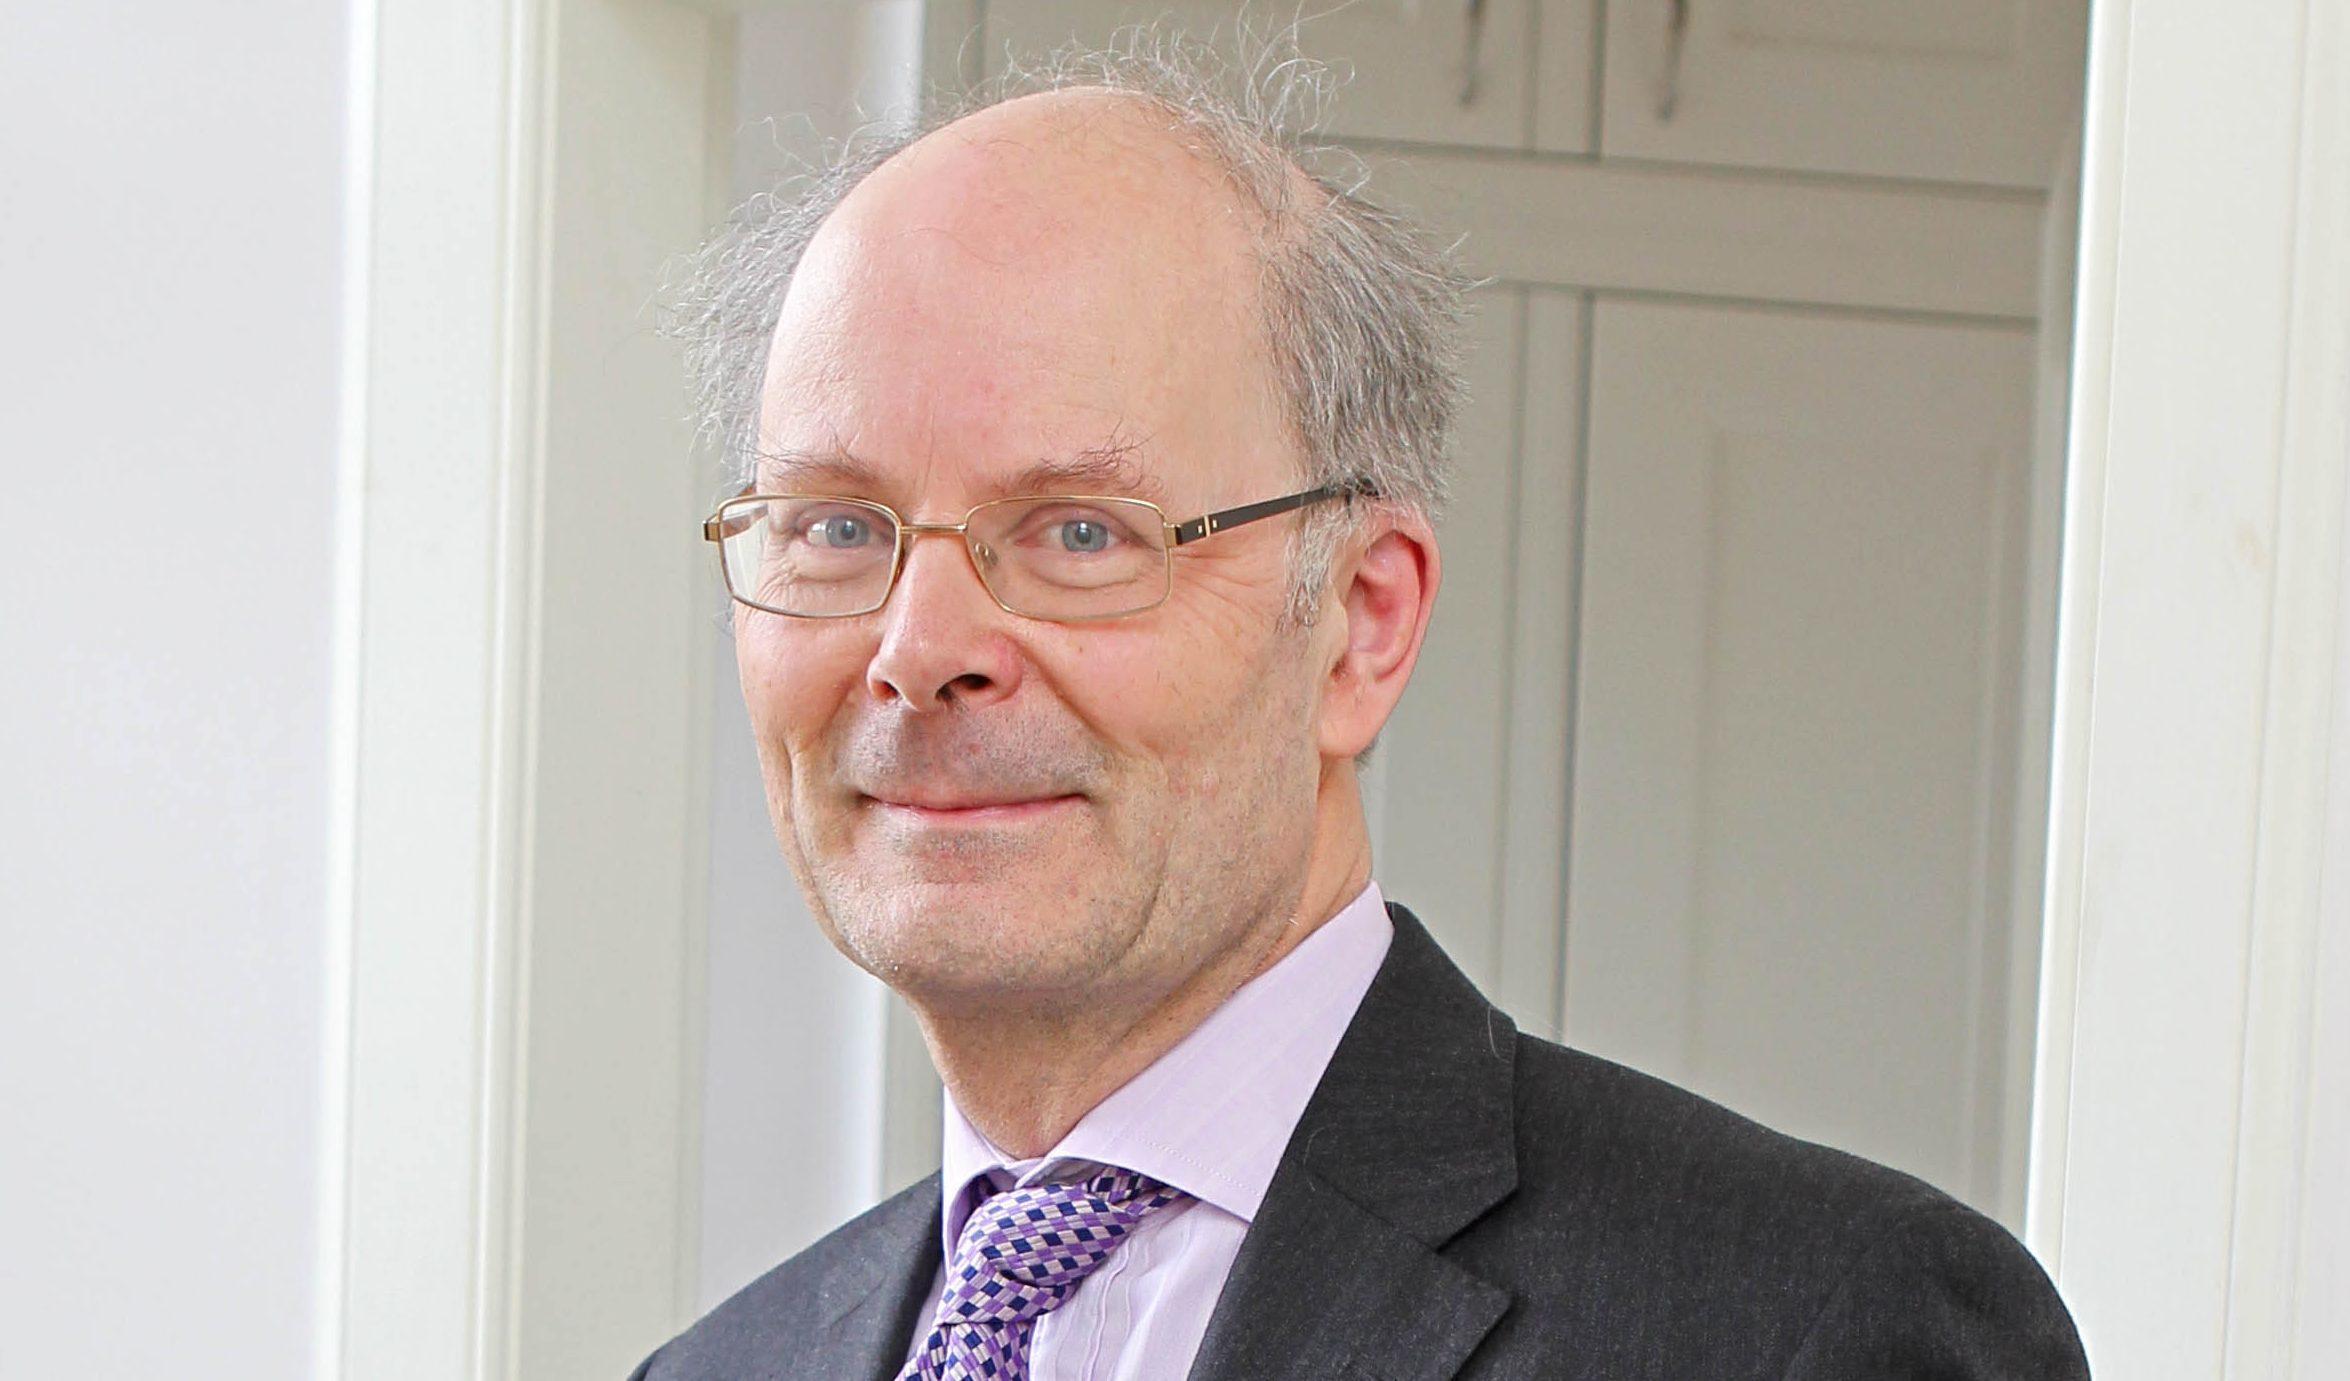 John Curtice, Professor of Politics, Strathclyde University